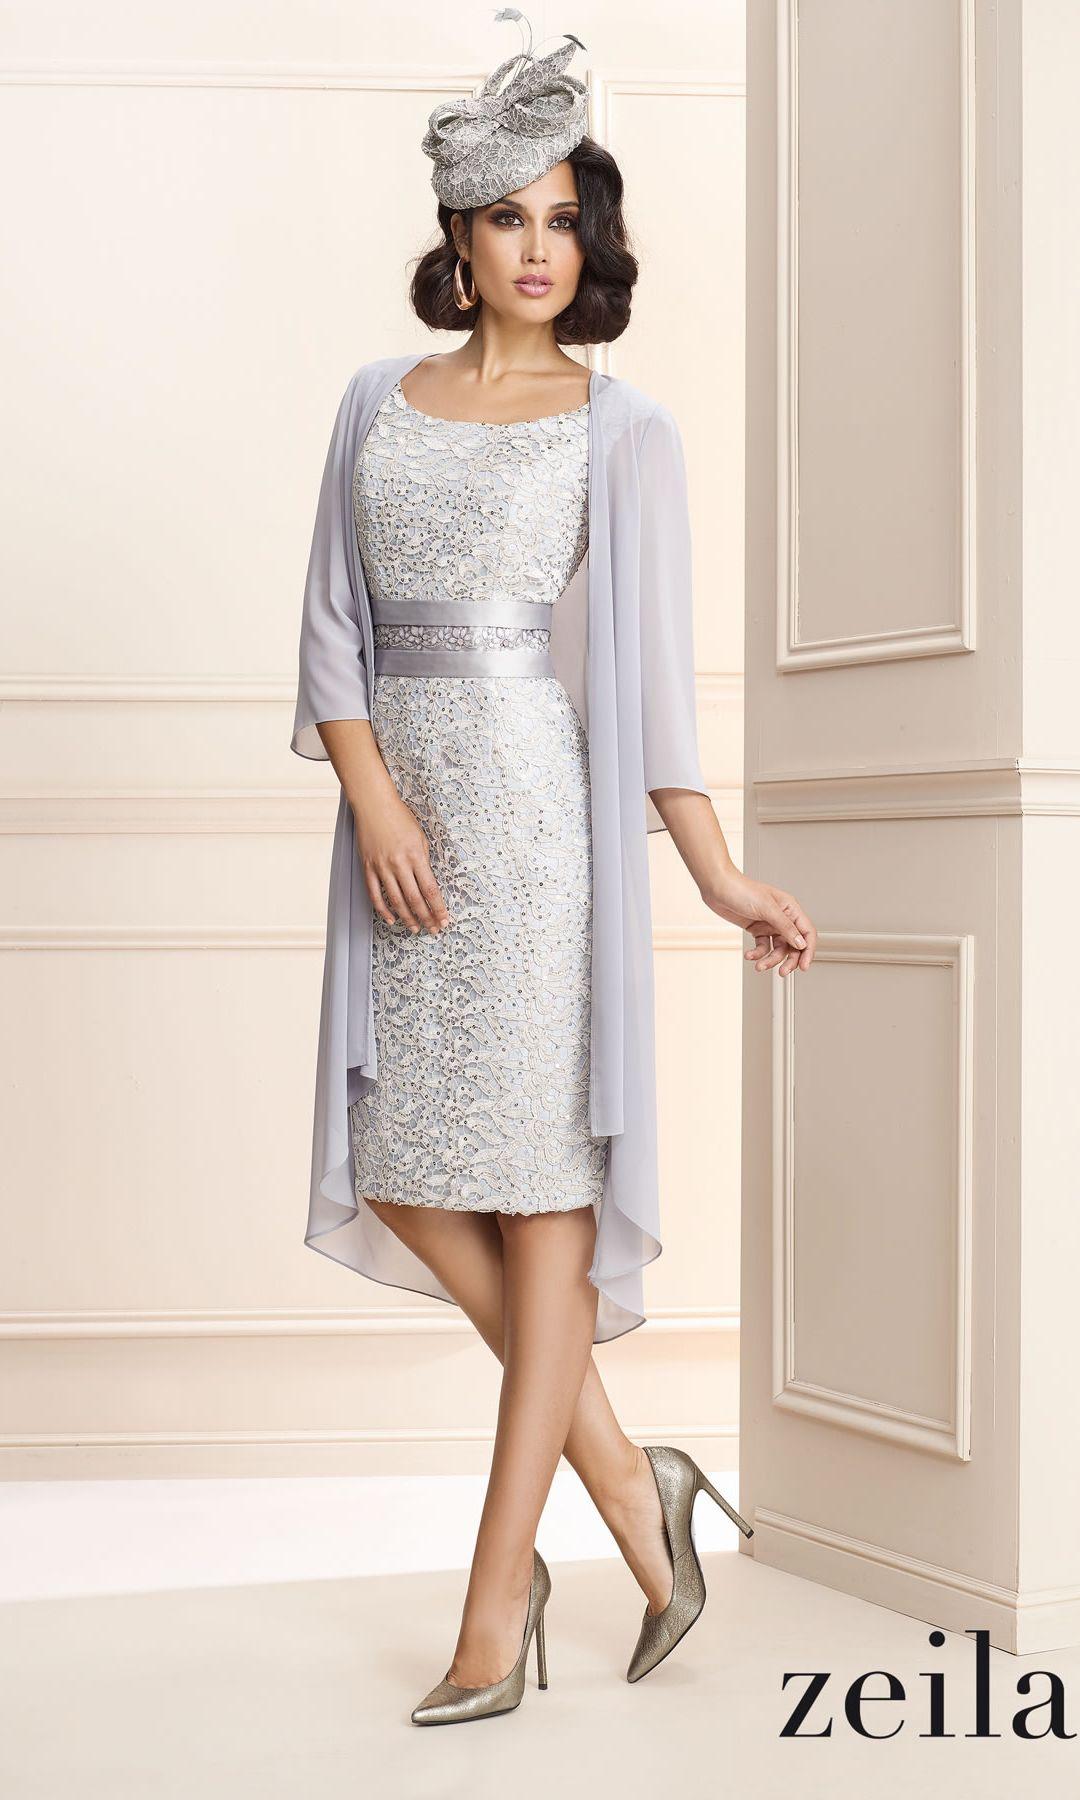 Zeila mother of the bride dress 3020122 | Mother of the Bride ...